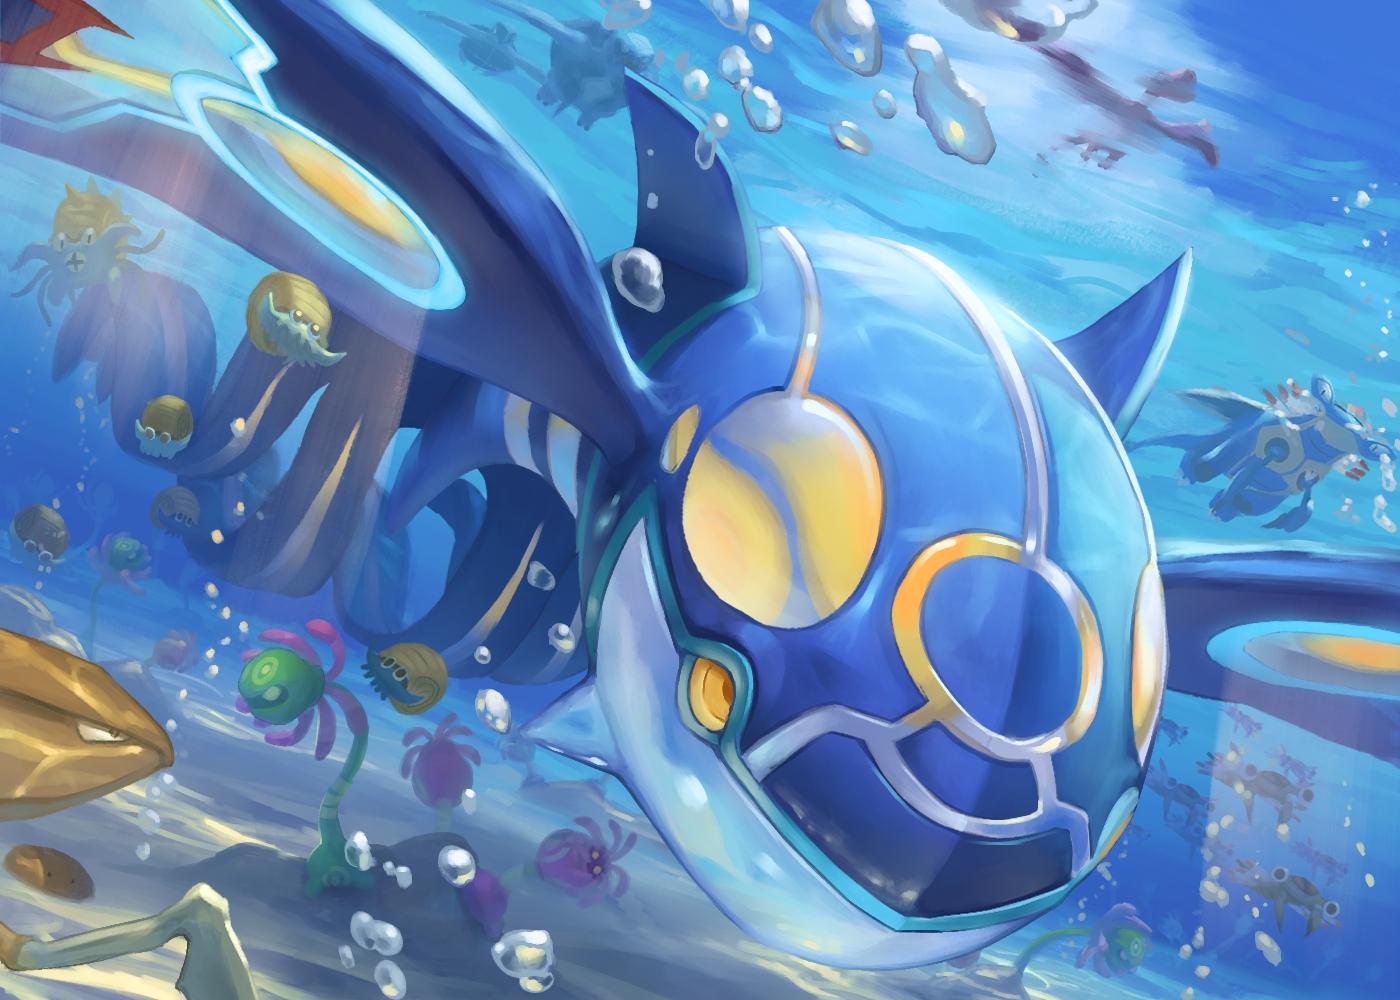 anorith armaldo bubbles cradily kabutops kyogre lileep nobody omanyte pokemon spareribs underwater water